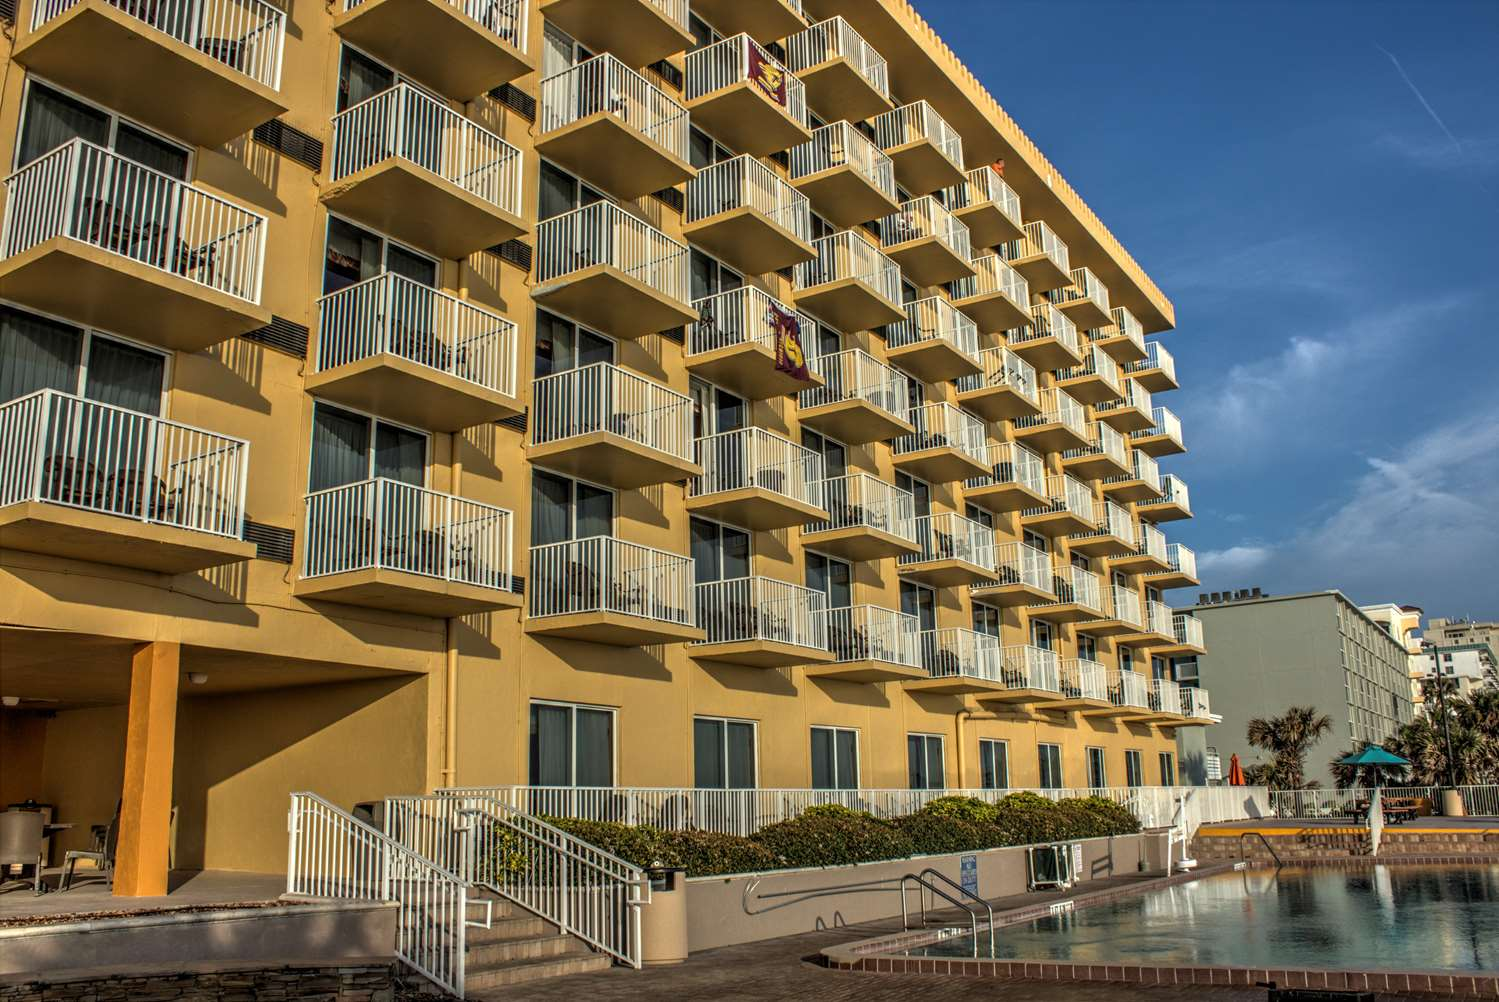 Best Western Castillo Del Sol Hotel Ormond Beach, FL - See Discounts